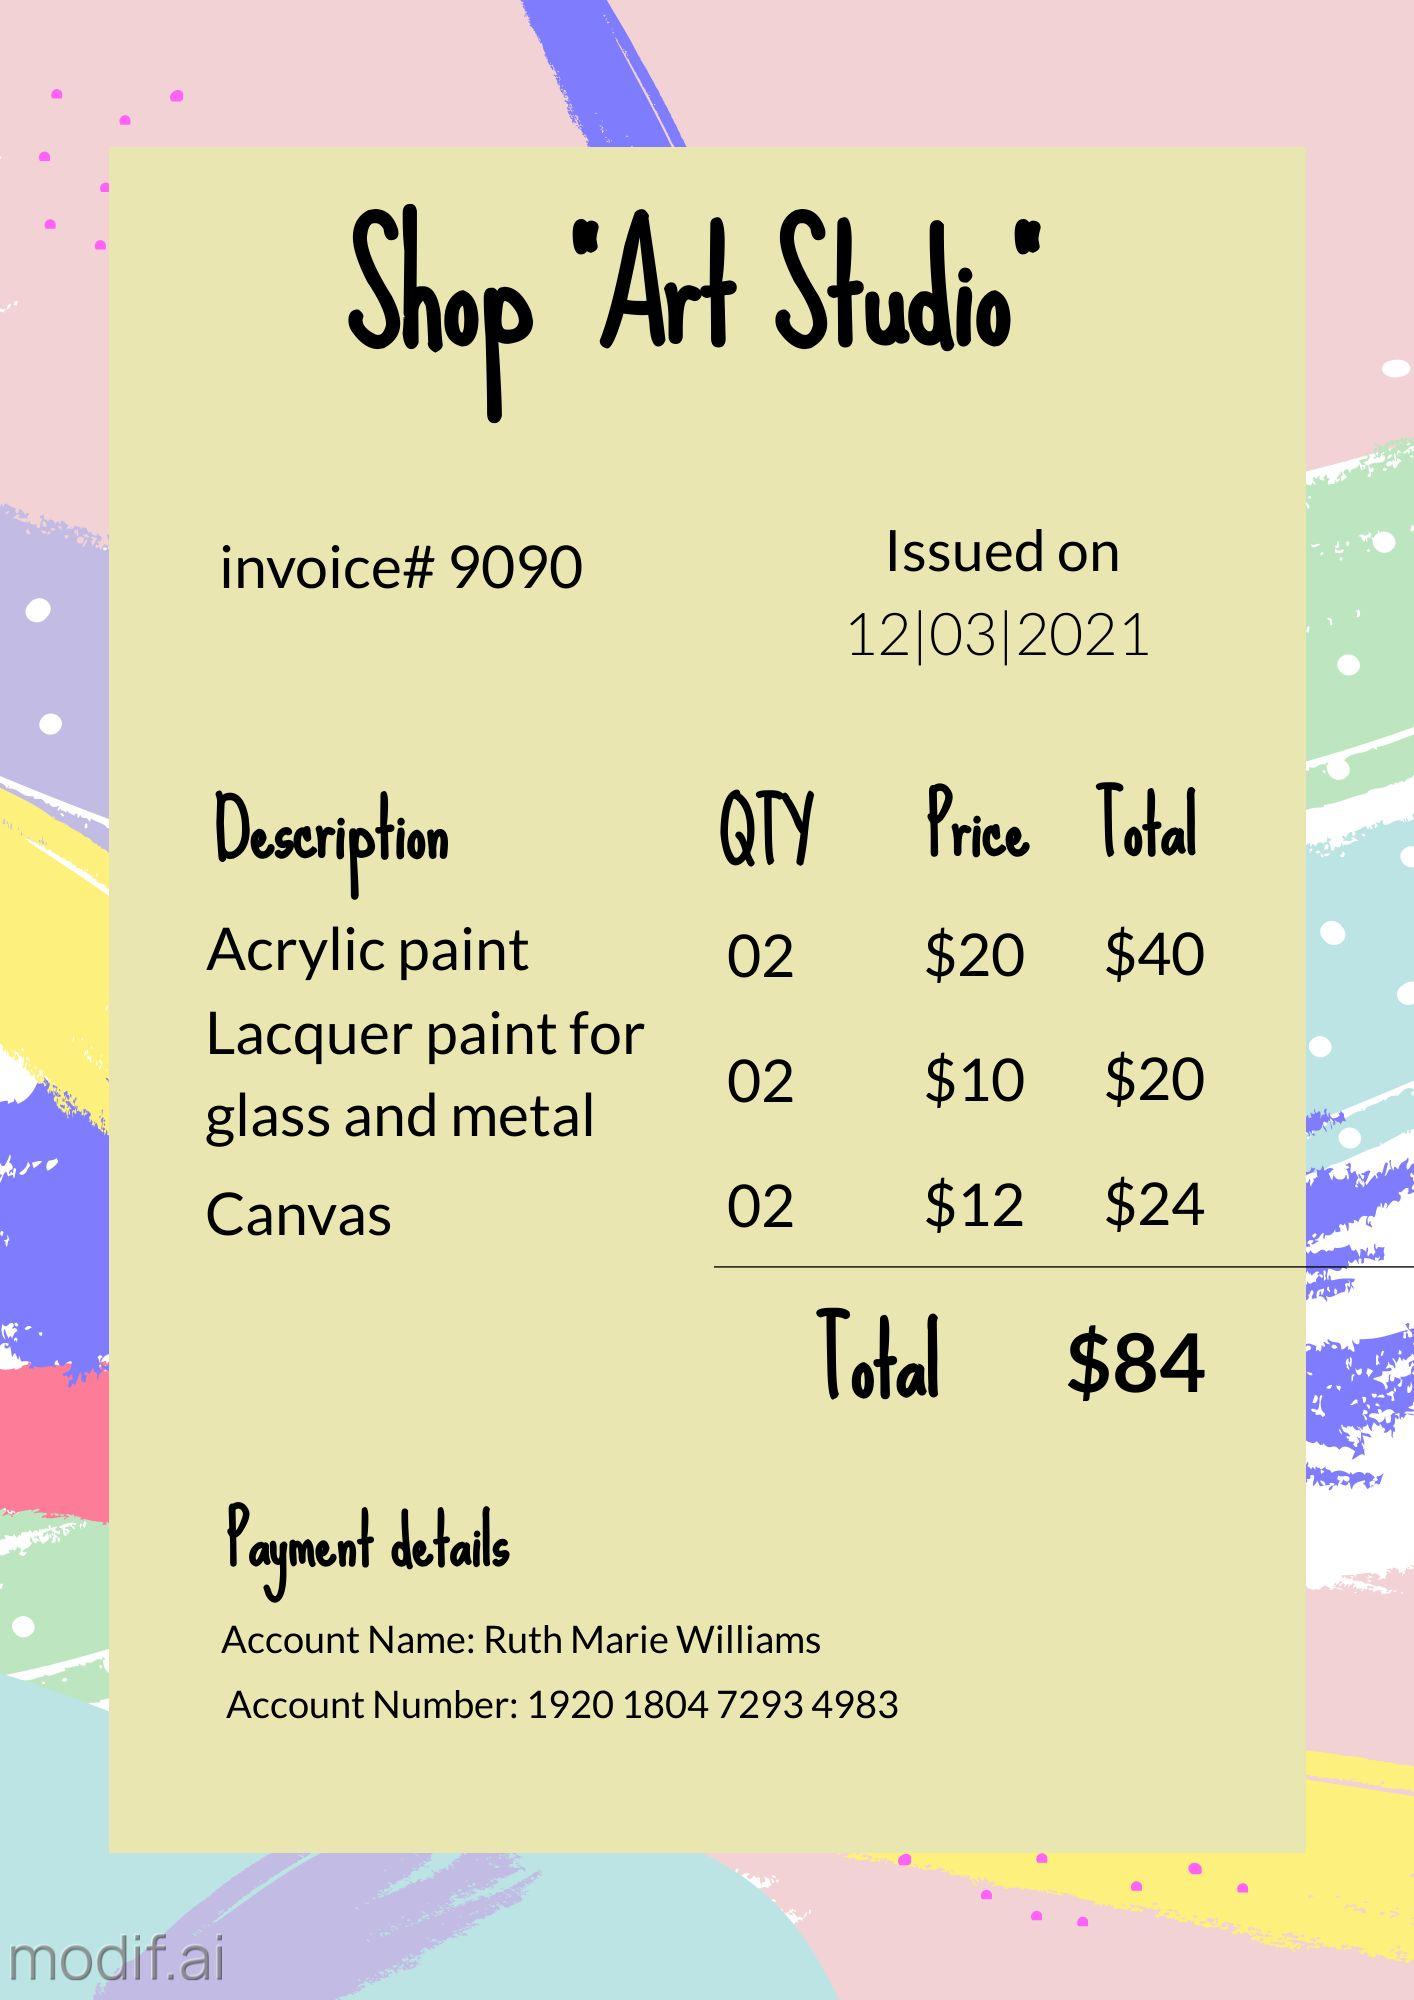 Shop Art Studio Invoice Design Template